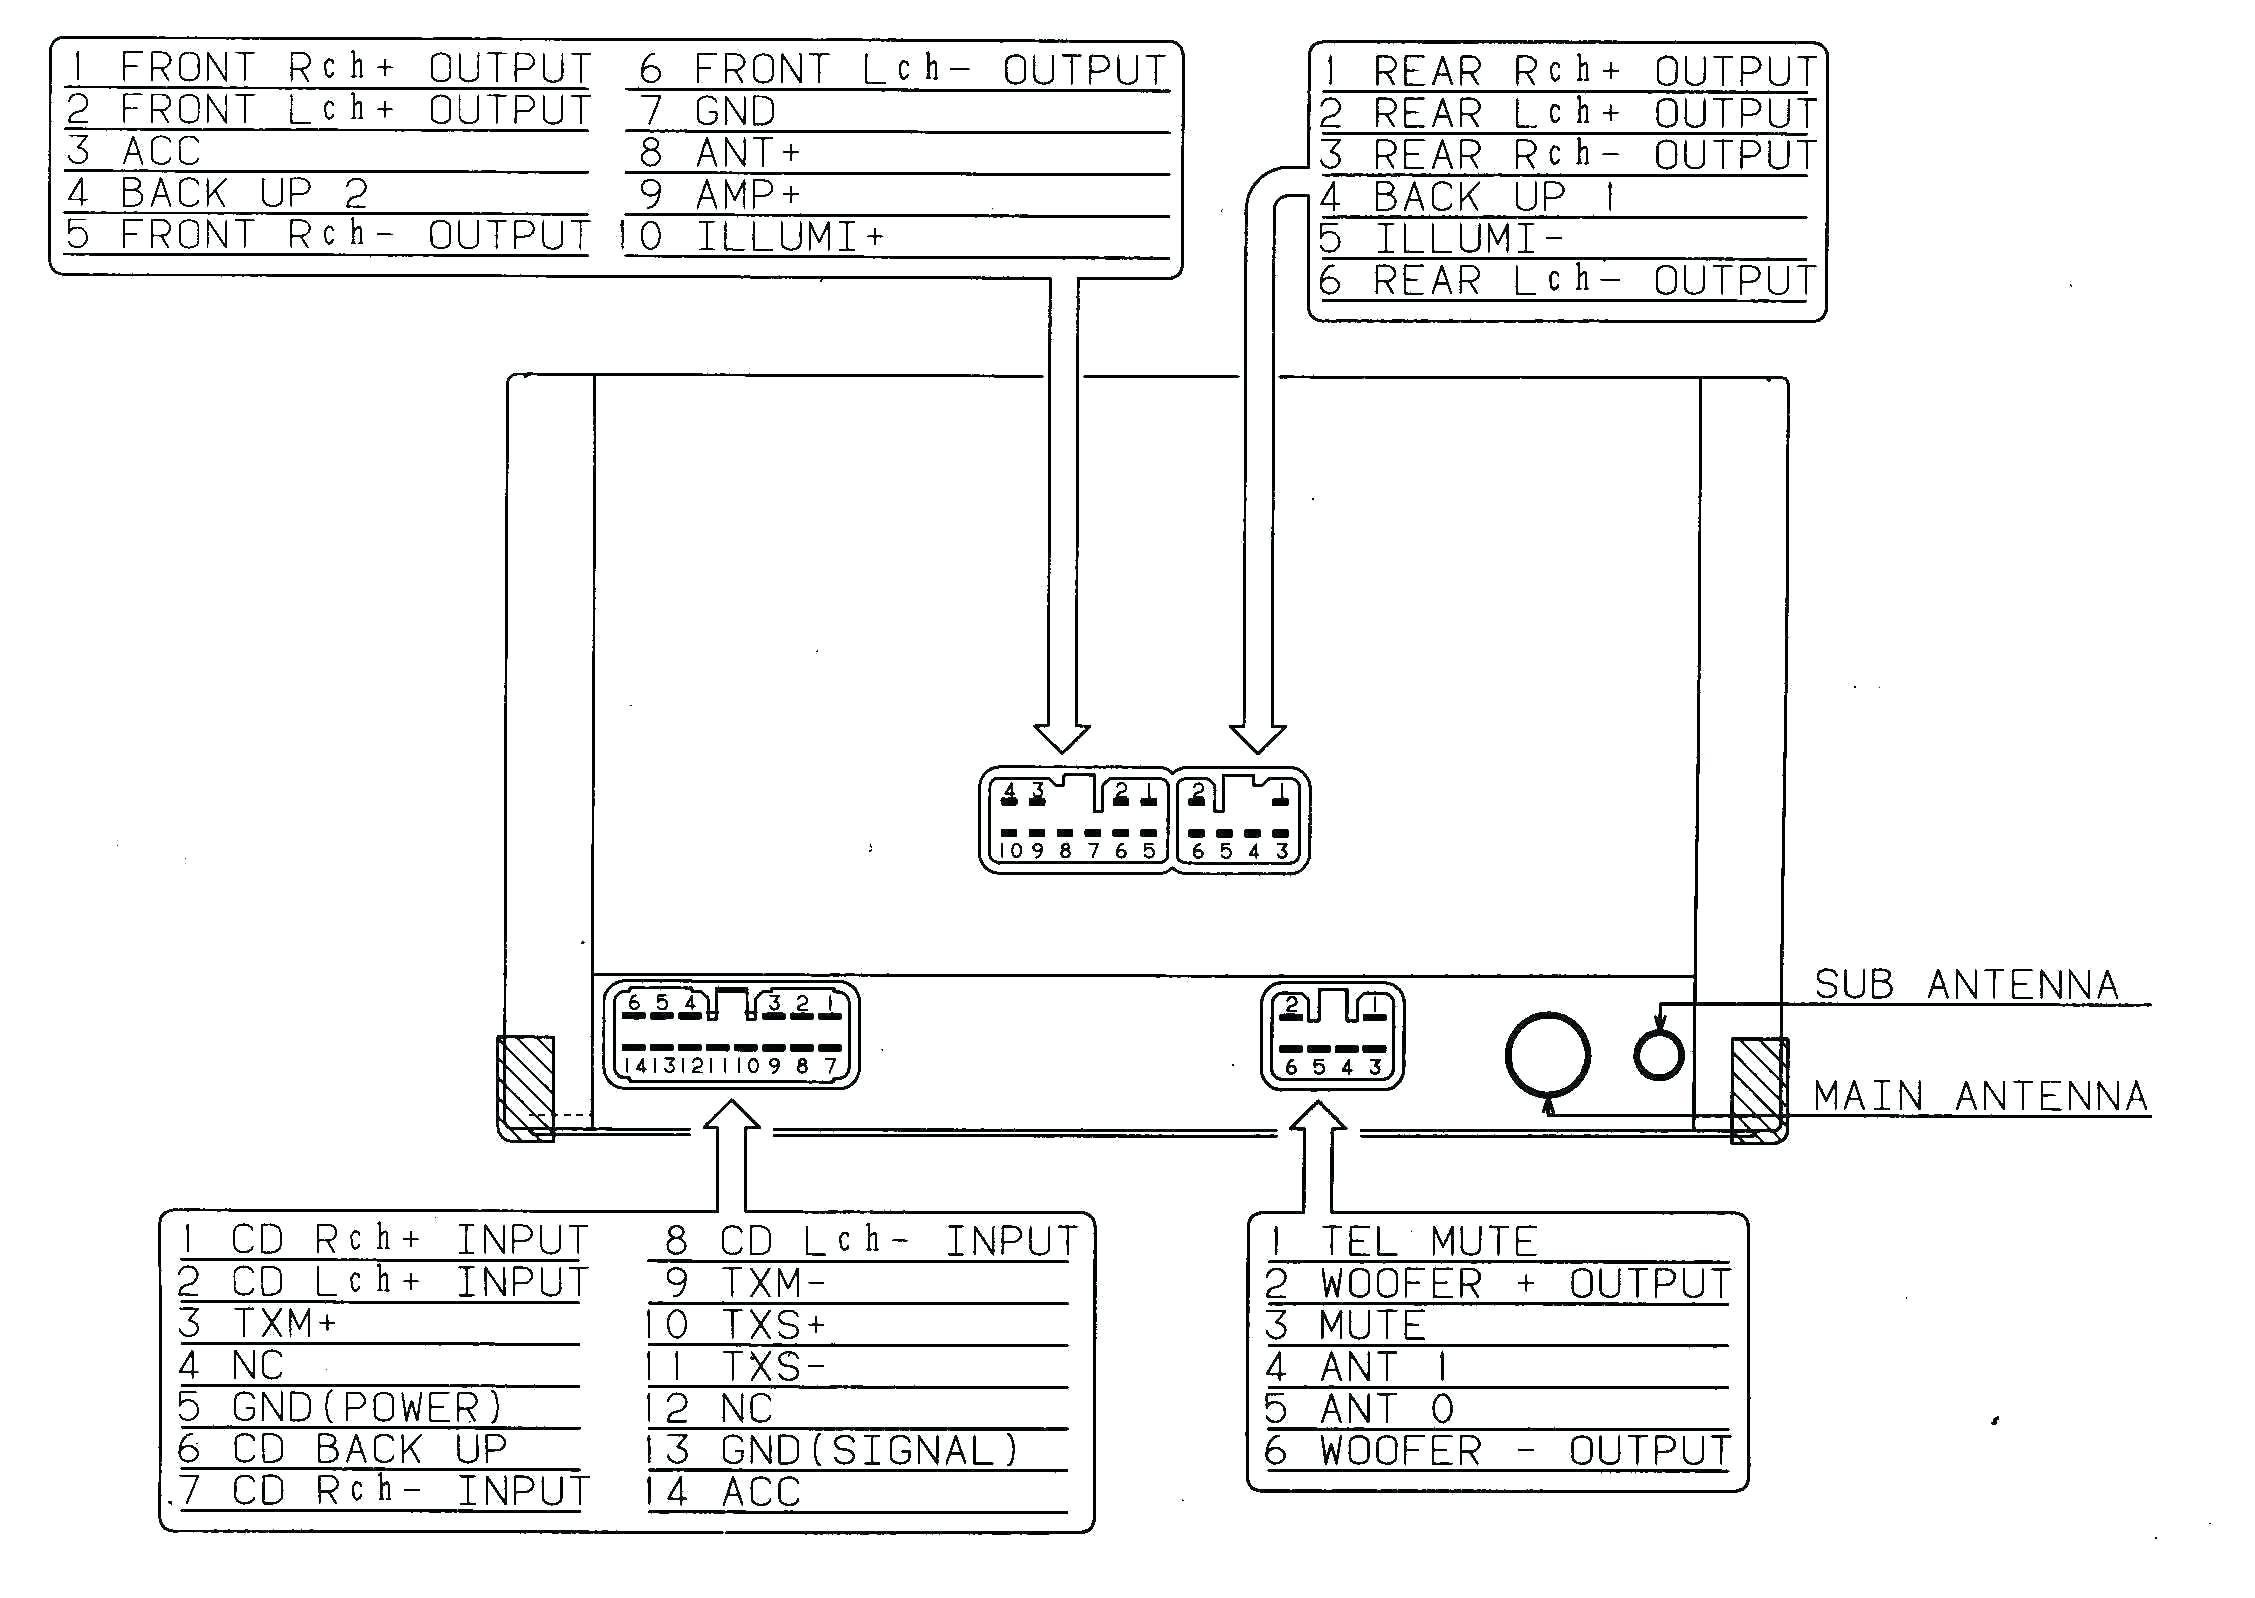 Pioneer Wiring Harness Diagram Fresh Wiring Diagram For A Pioneer - Pioneer Avh-280Bt Wiring Diagram